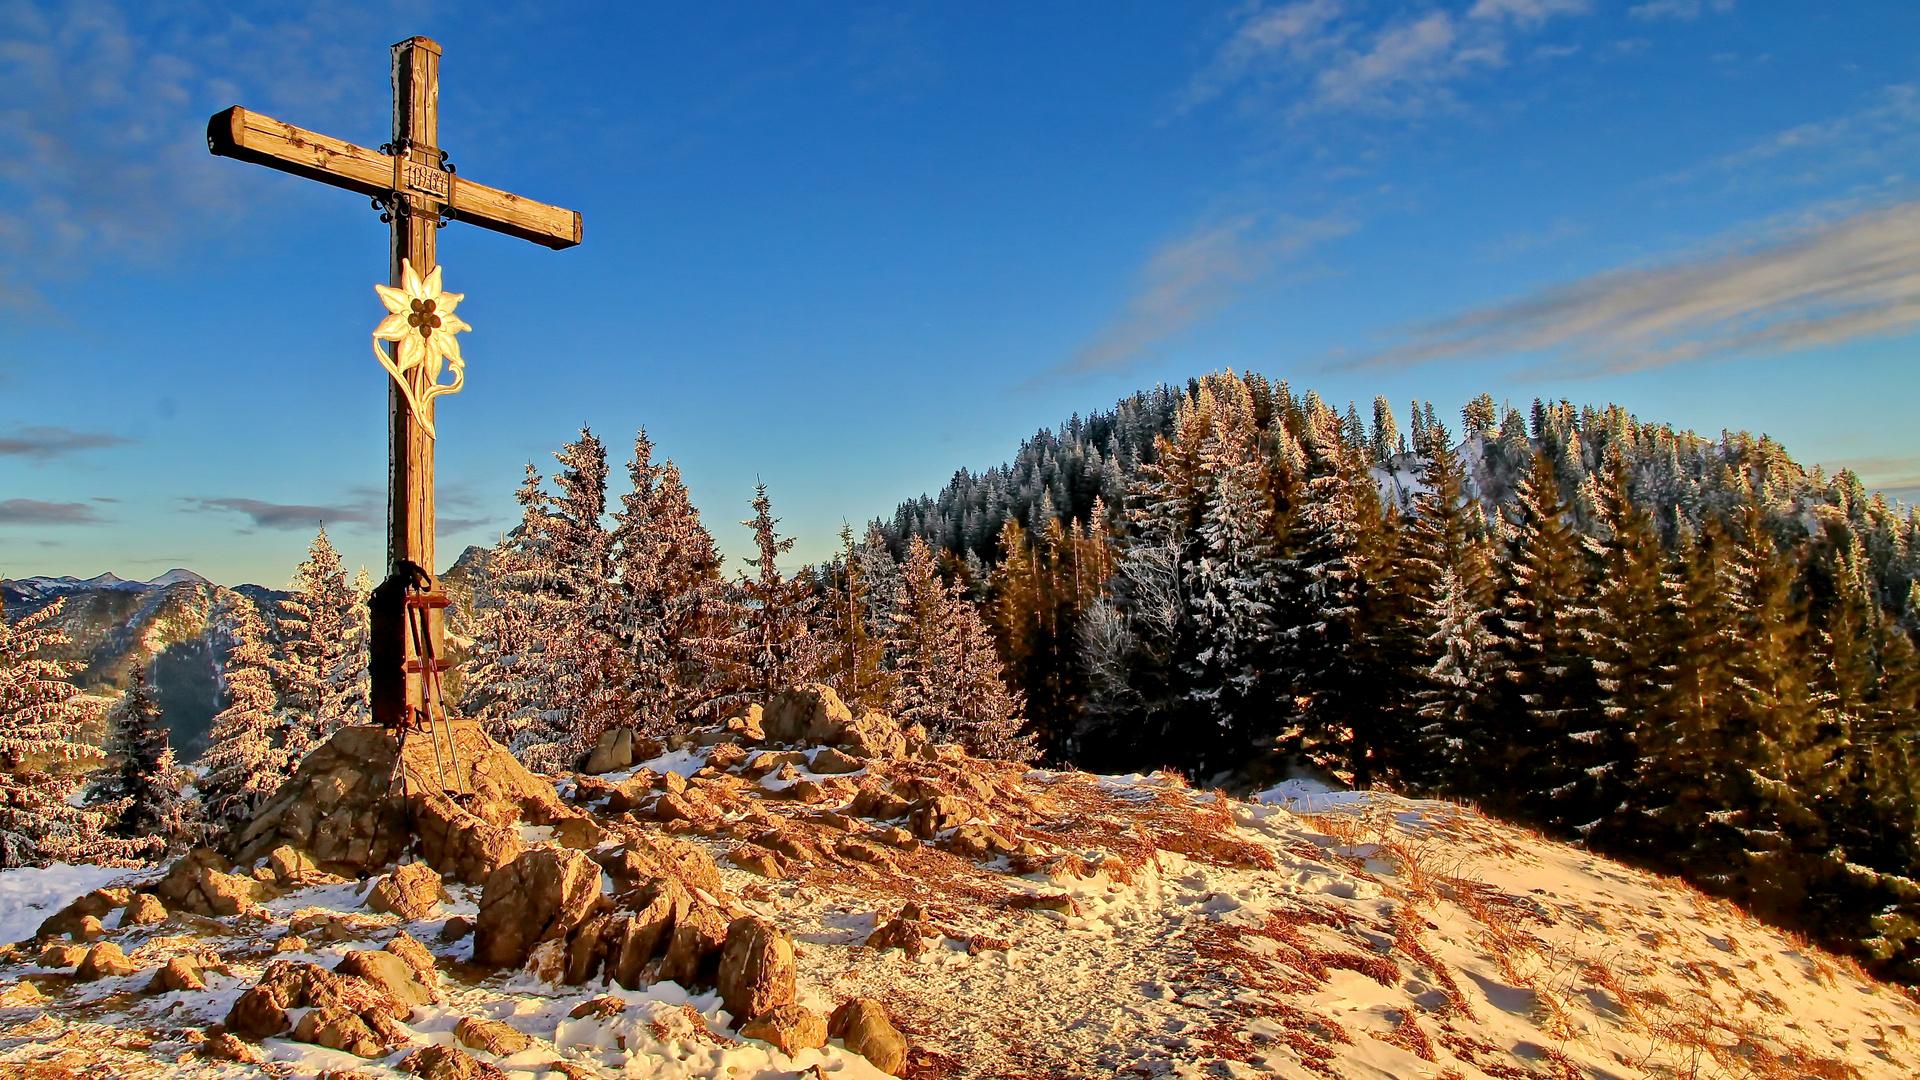 Gipfelkreuz auf dem Heuberg im Chiemgau